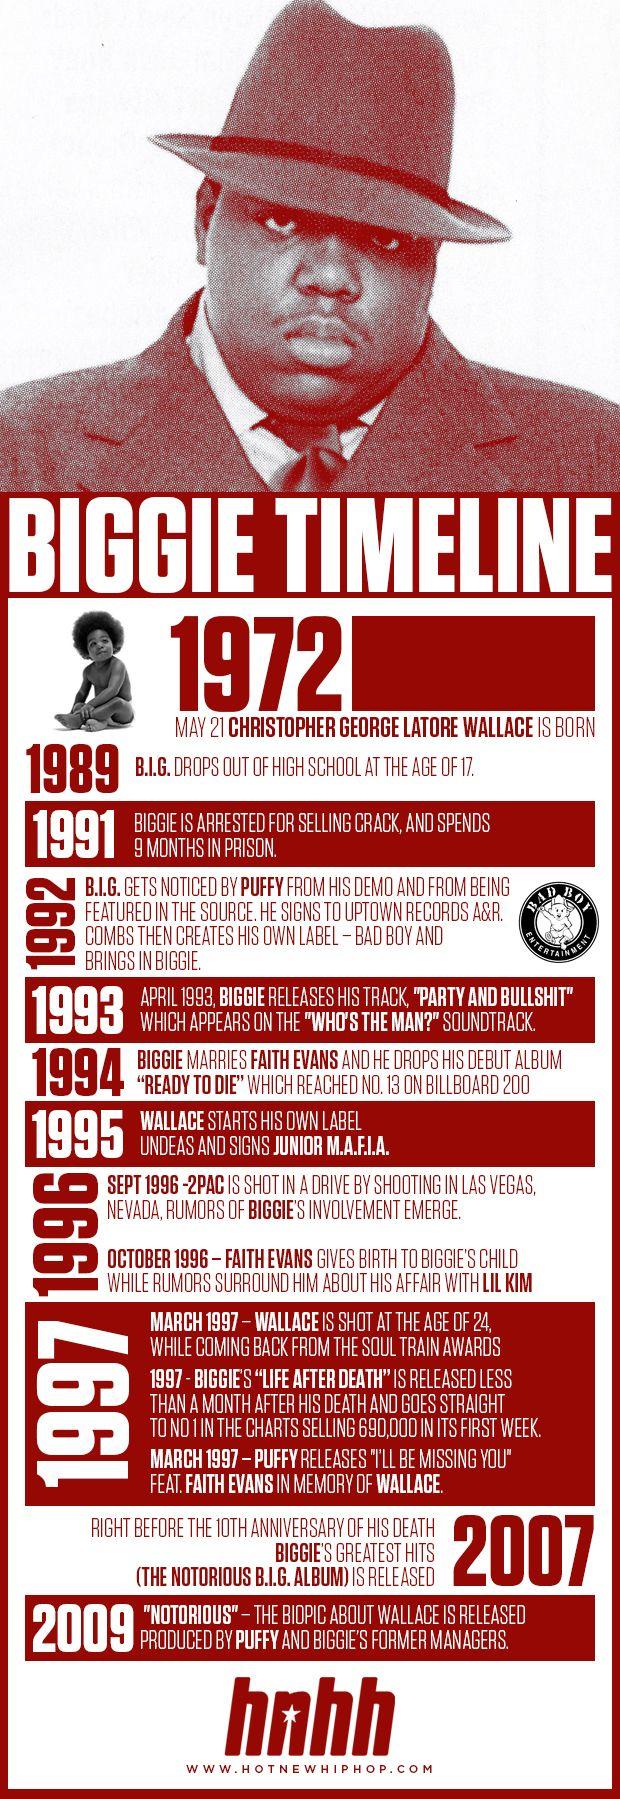 Image from http://hushtours.com/rmx/wp-content/uploads/2014/10/biggie_infographic-2.jpg.